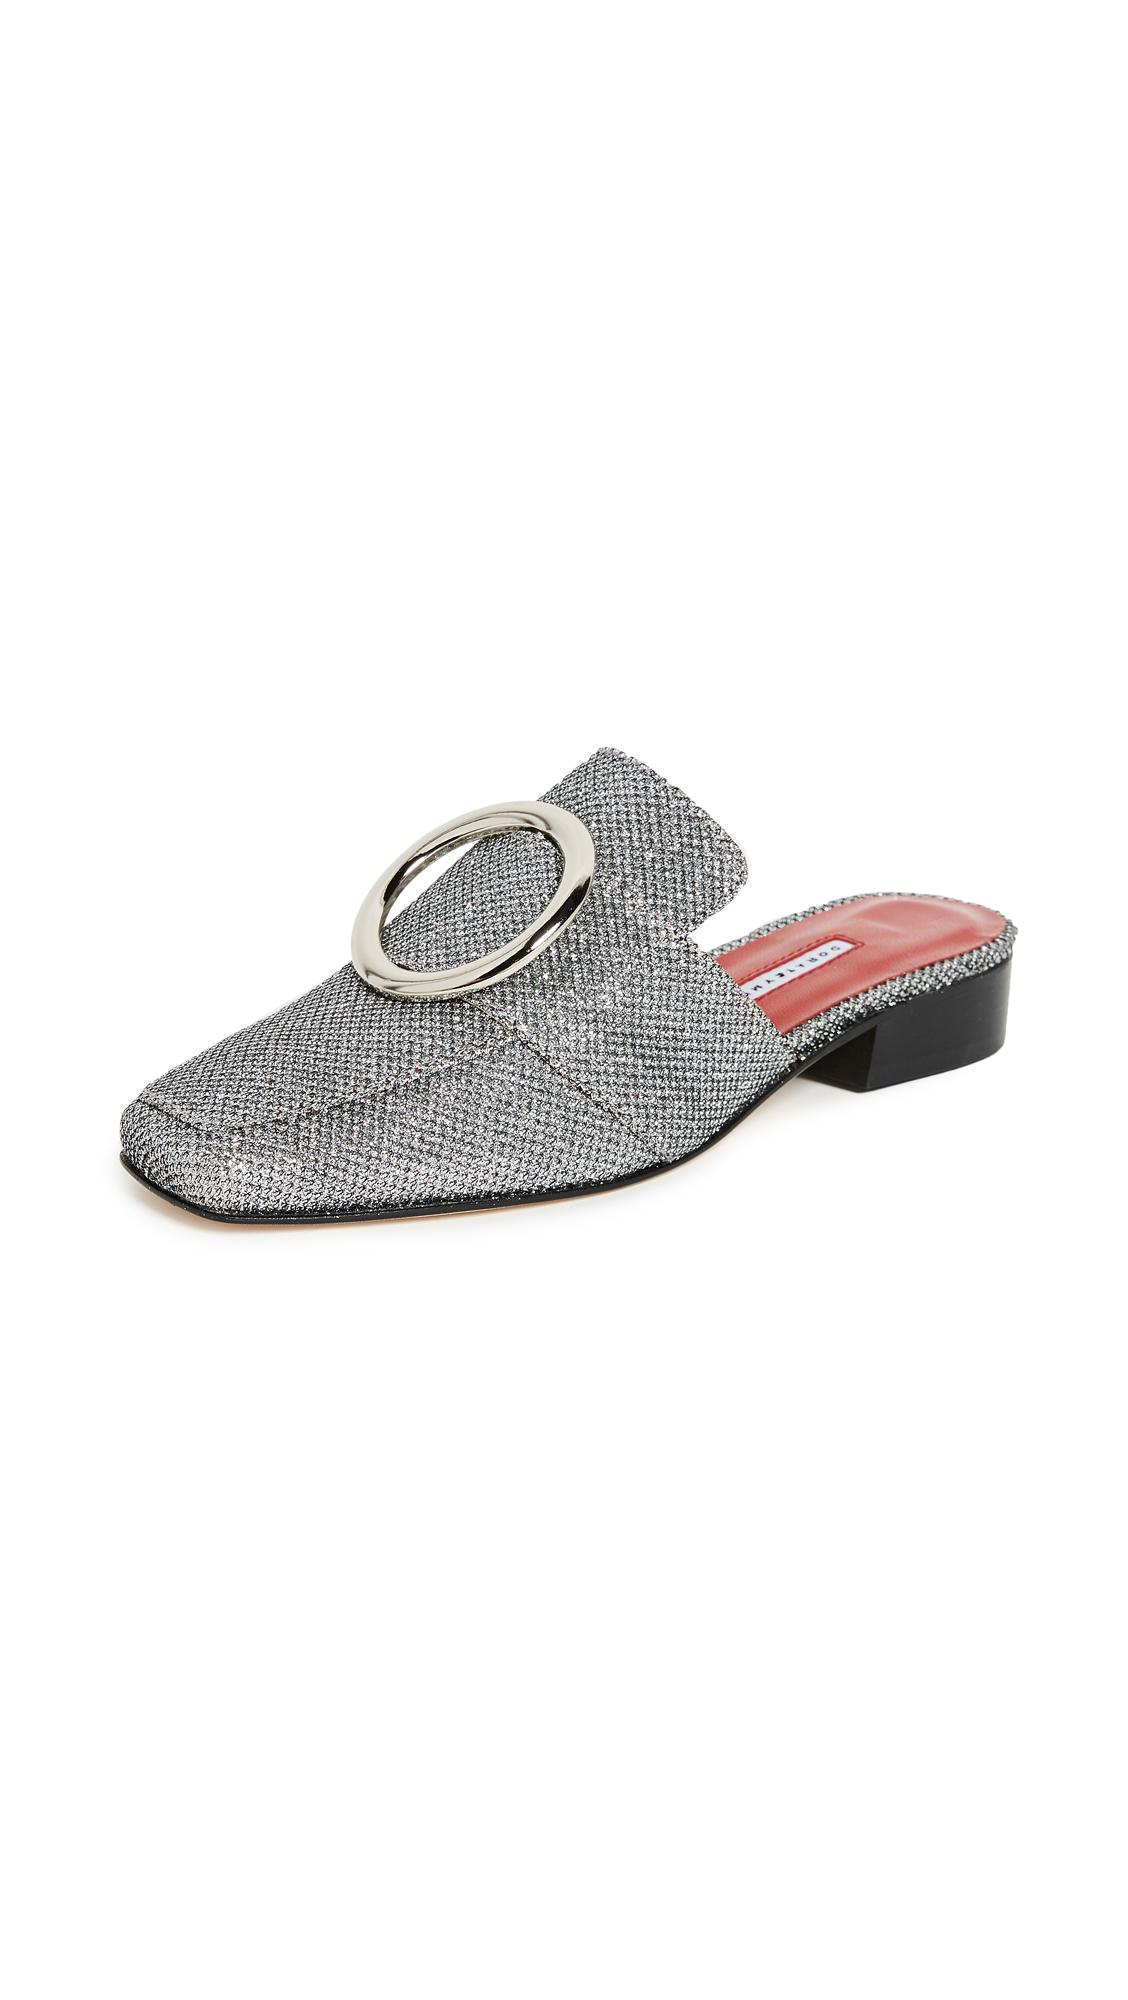 Dorateymur Petrol Slides - Silver